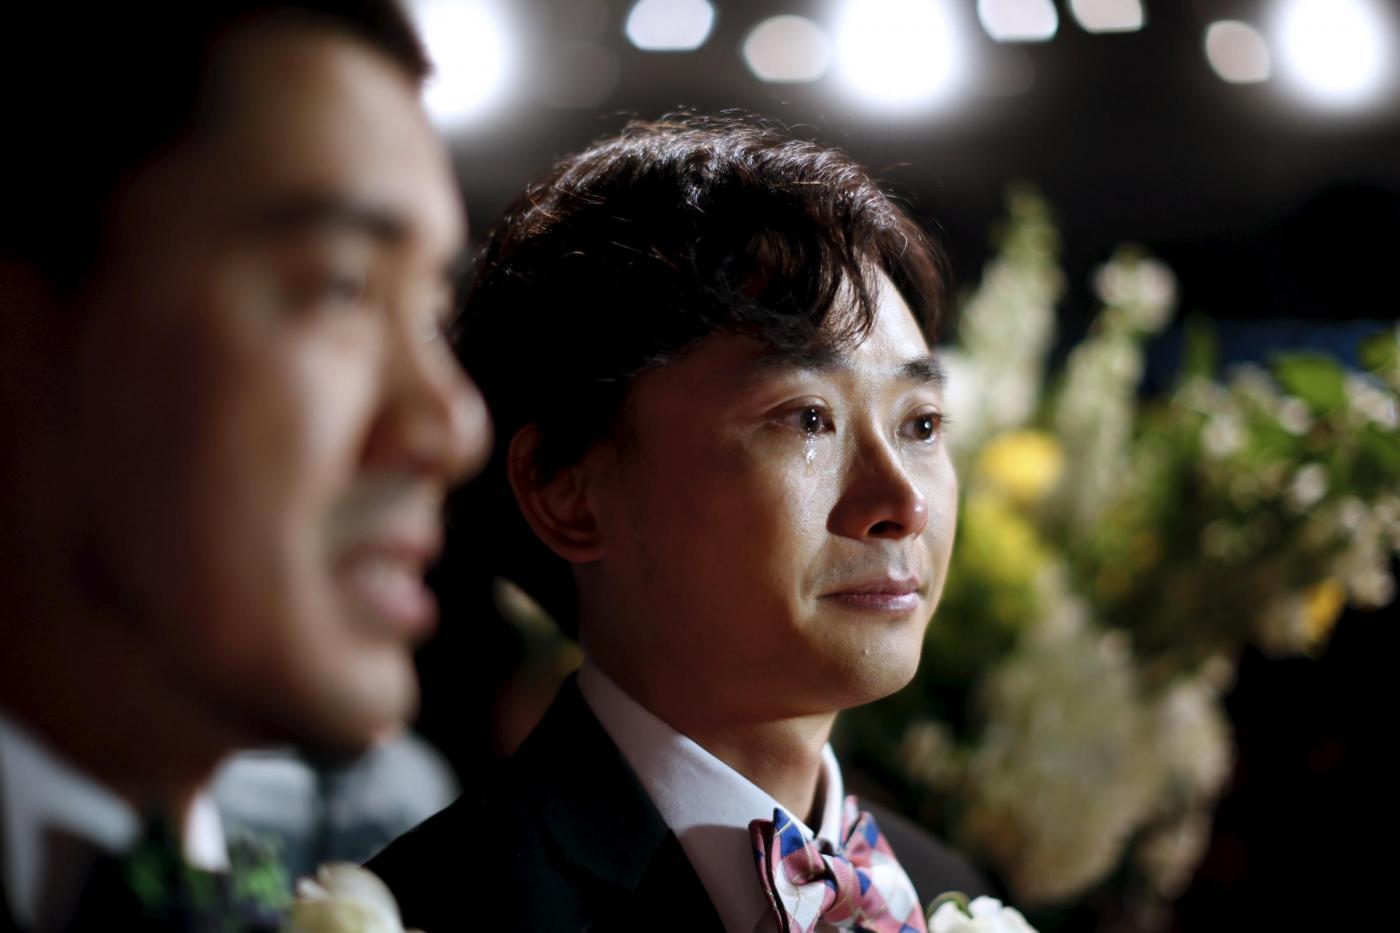 Sette coppie omosessuali cinesi si sposano a Los Angeles06